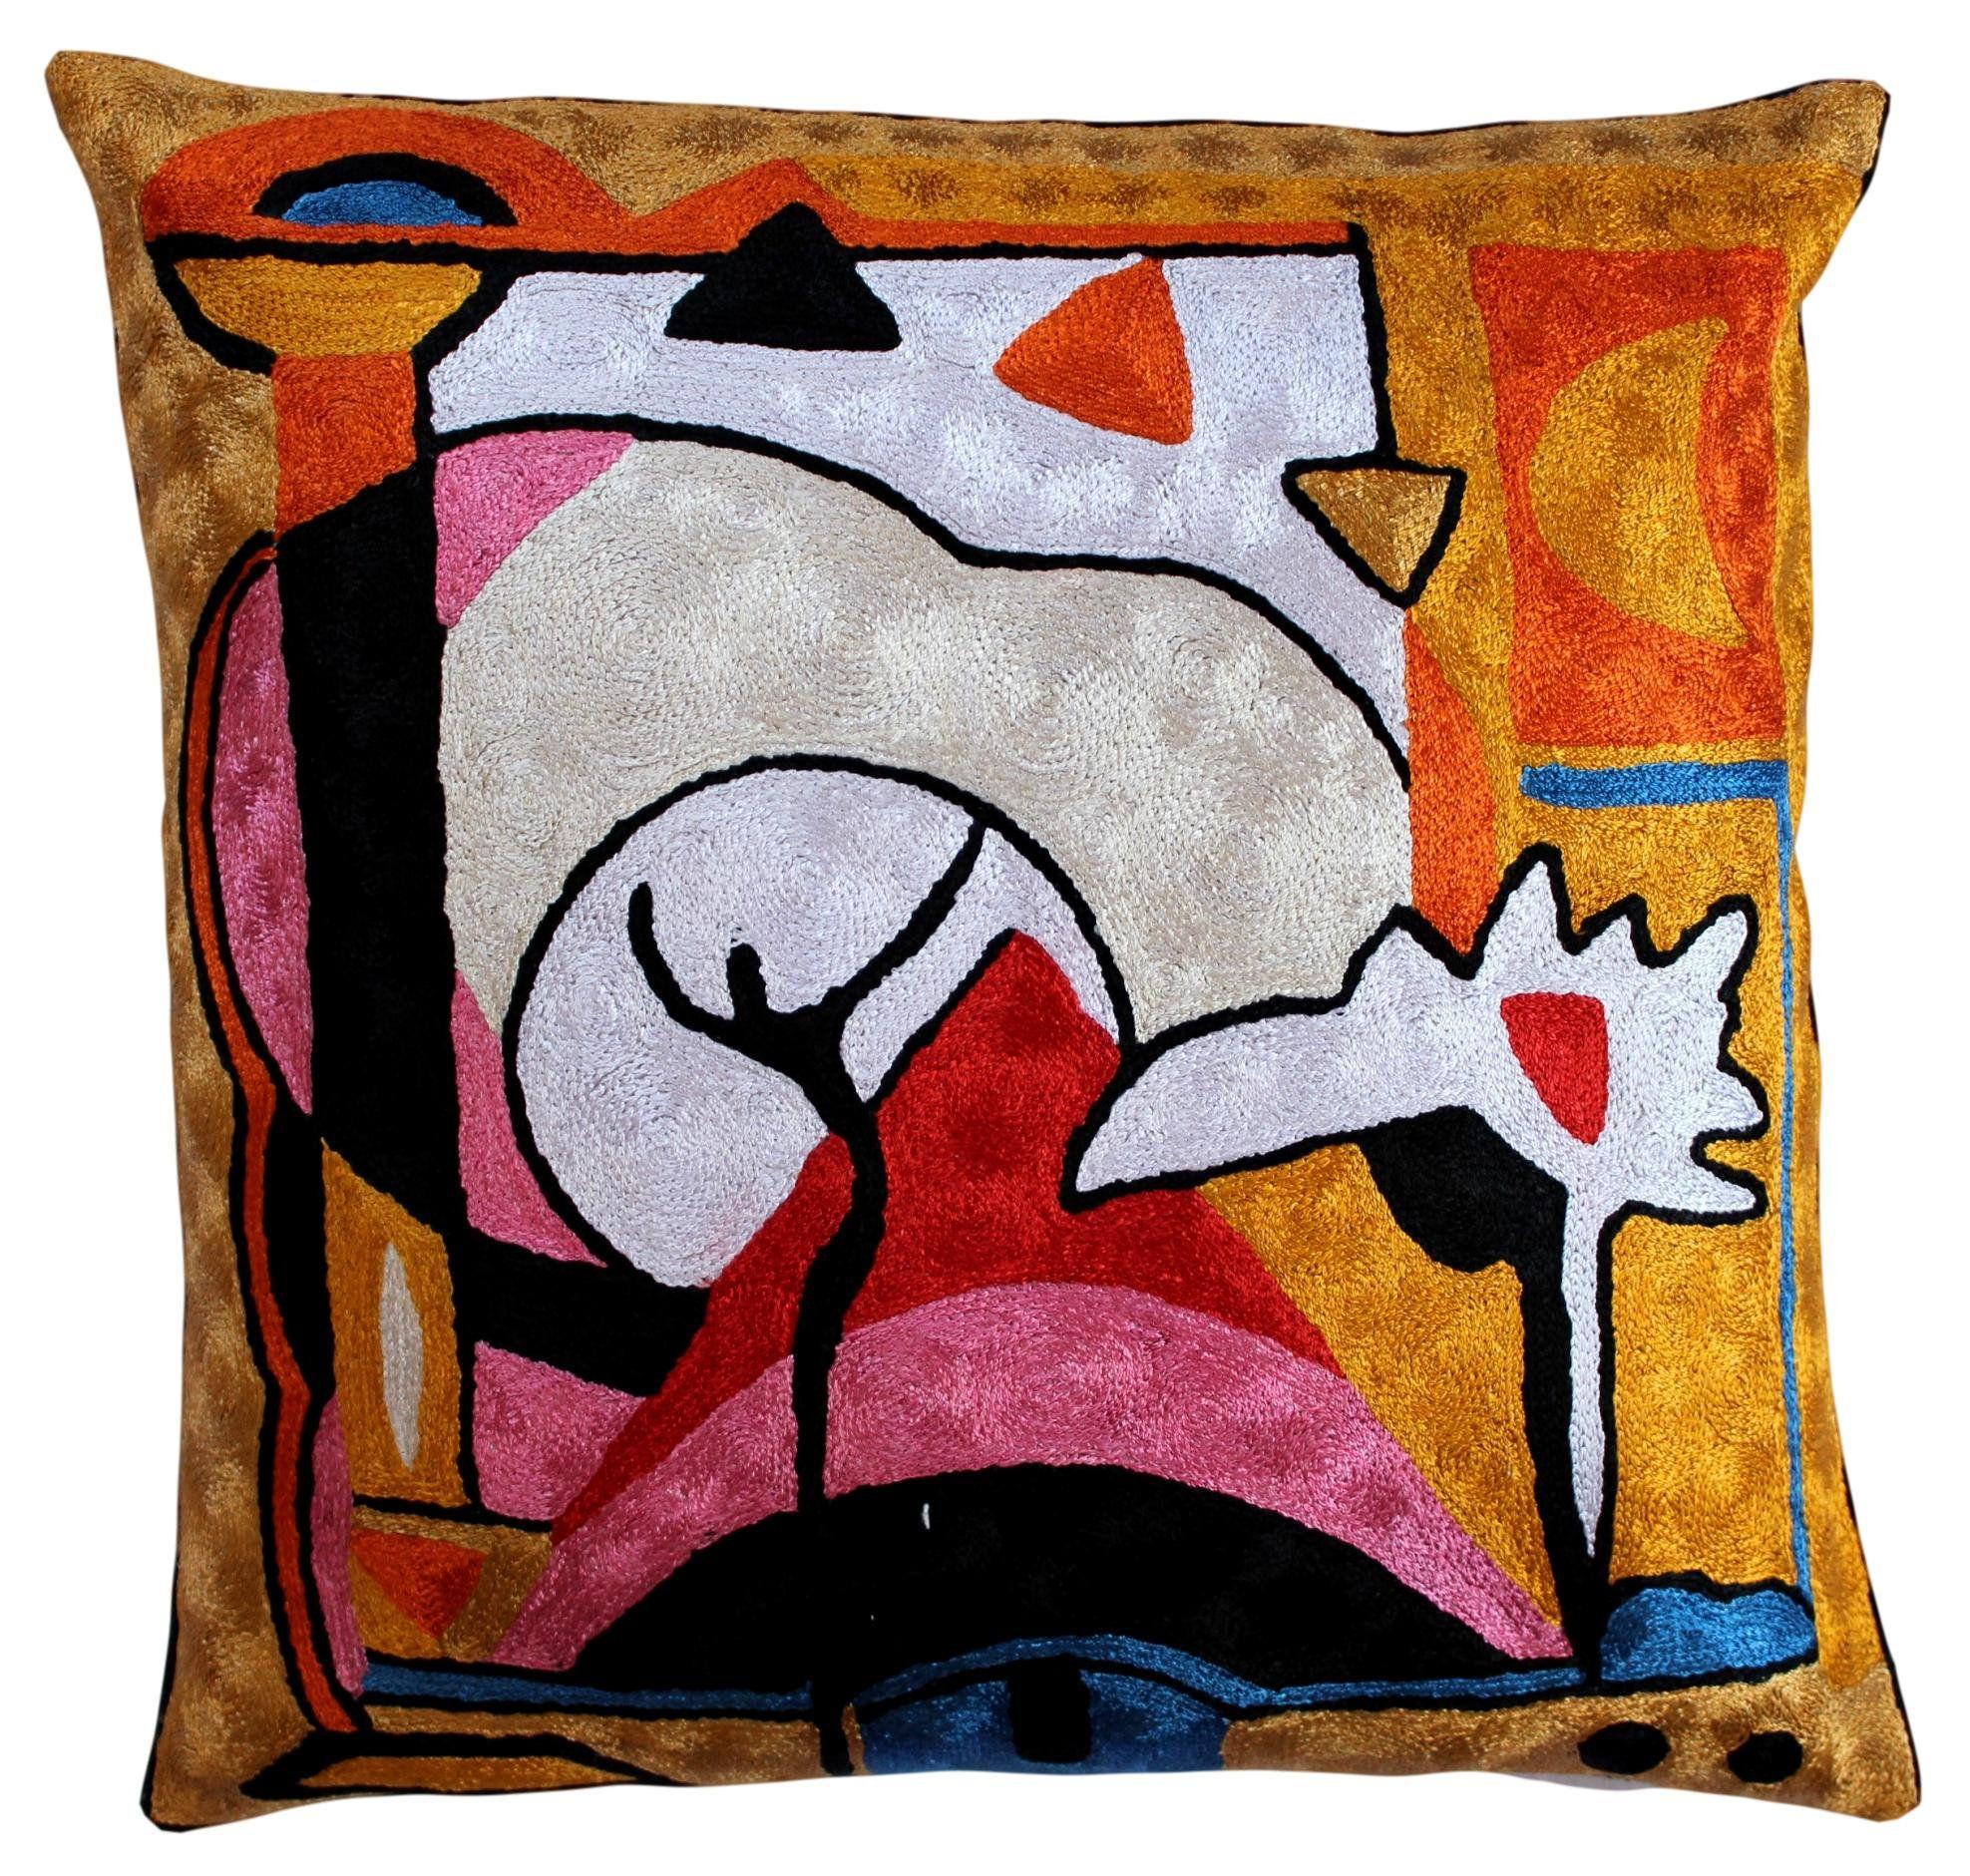 Pin by designer kashmir on handmade cushion covers pinterest